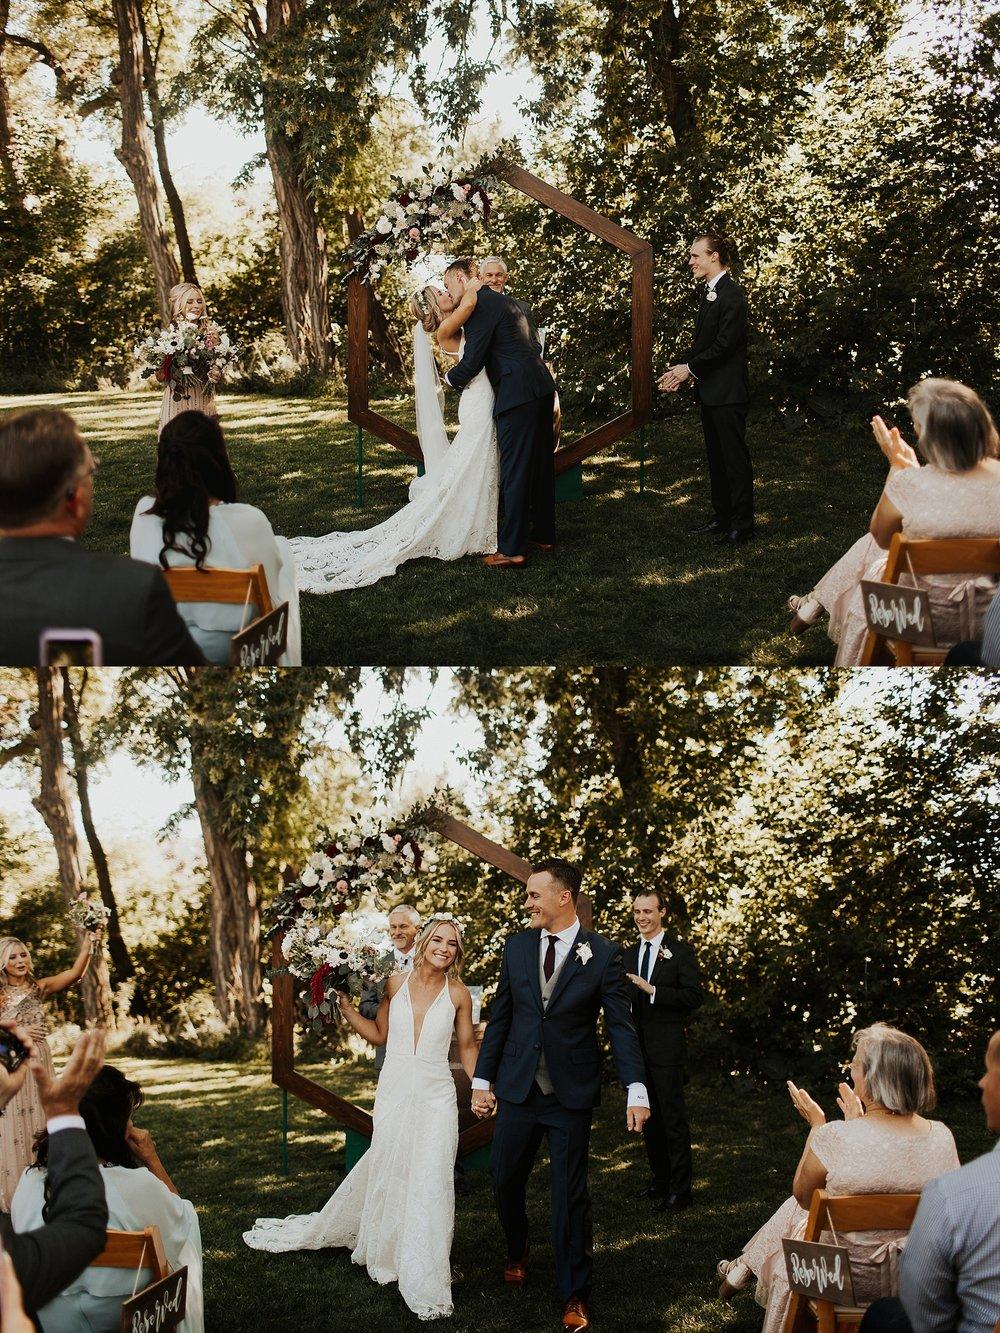 Lyons_Farmette_Wedding_Denver_Colorado_wedding047.JPG